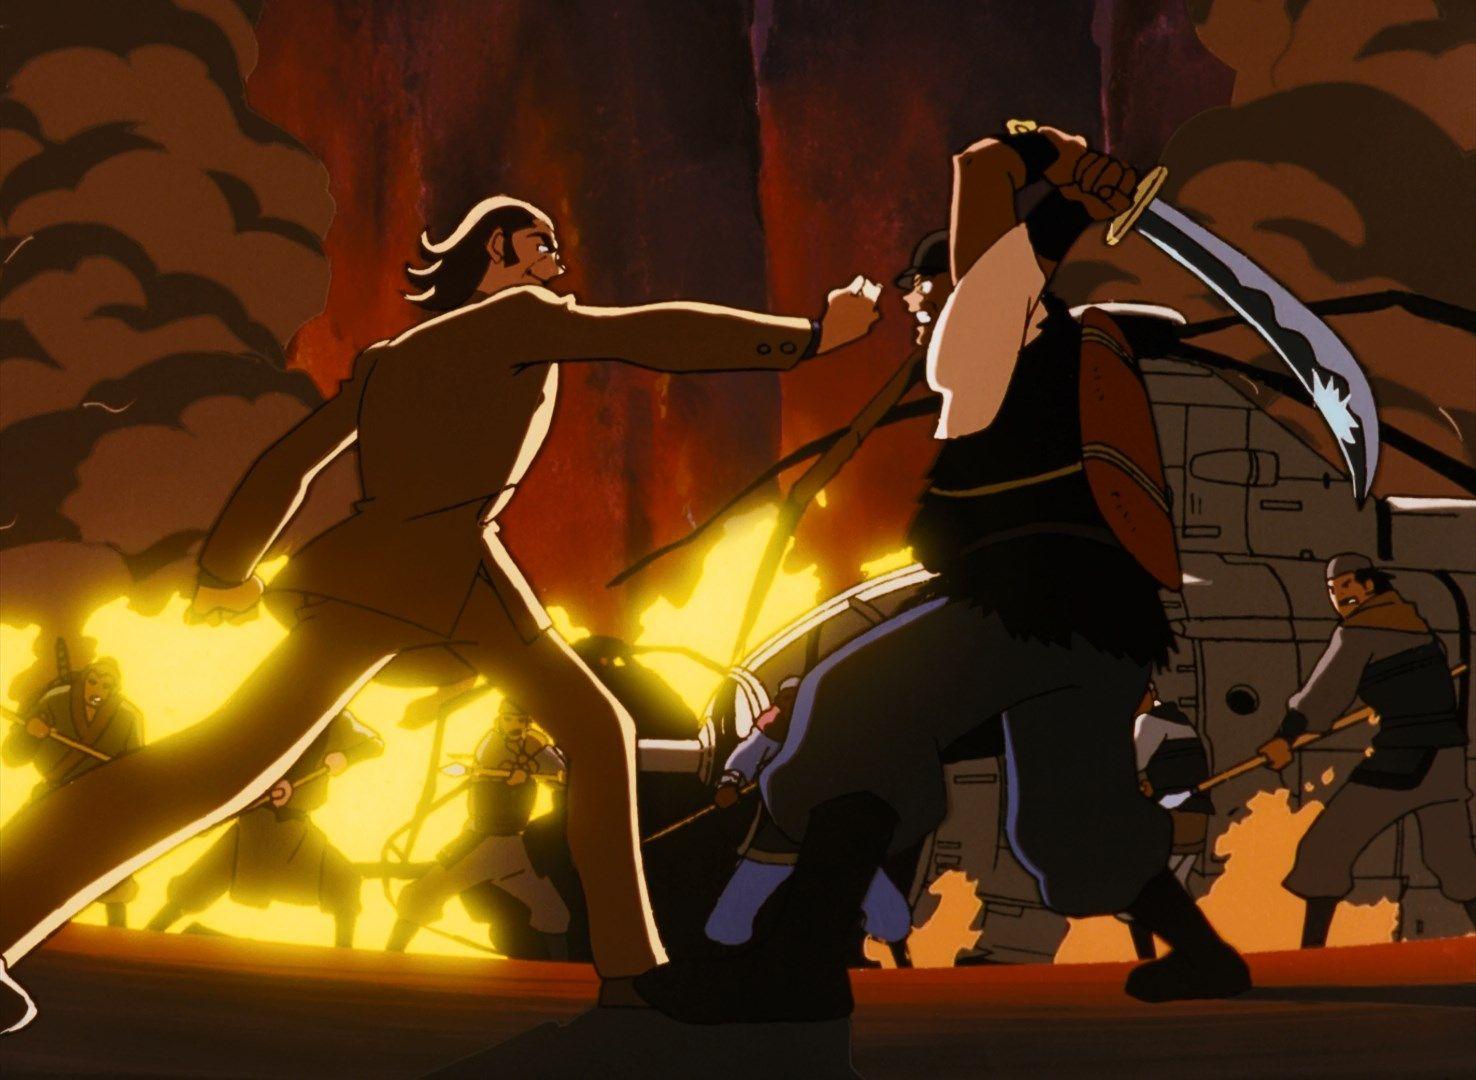 Top 30 Anime Series of All Time (con imágenes) Robo